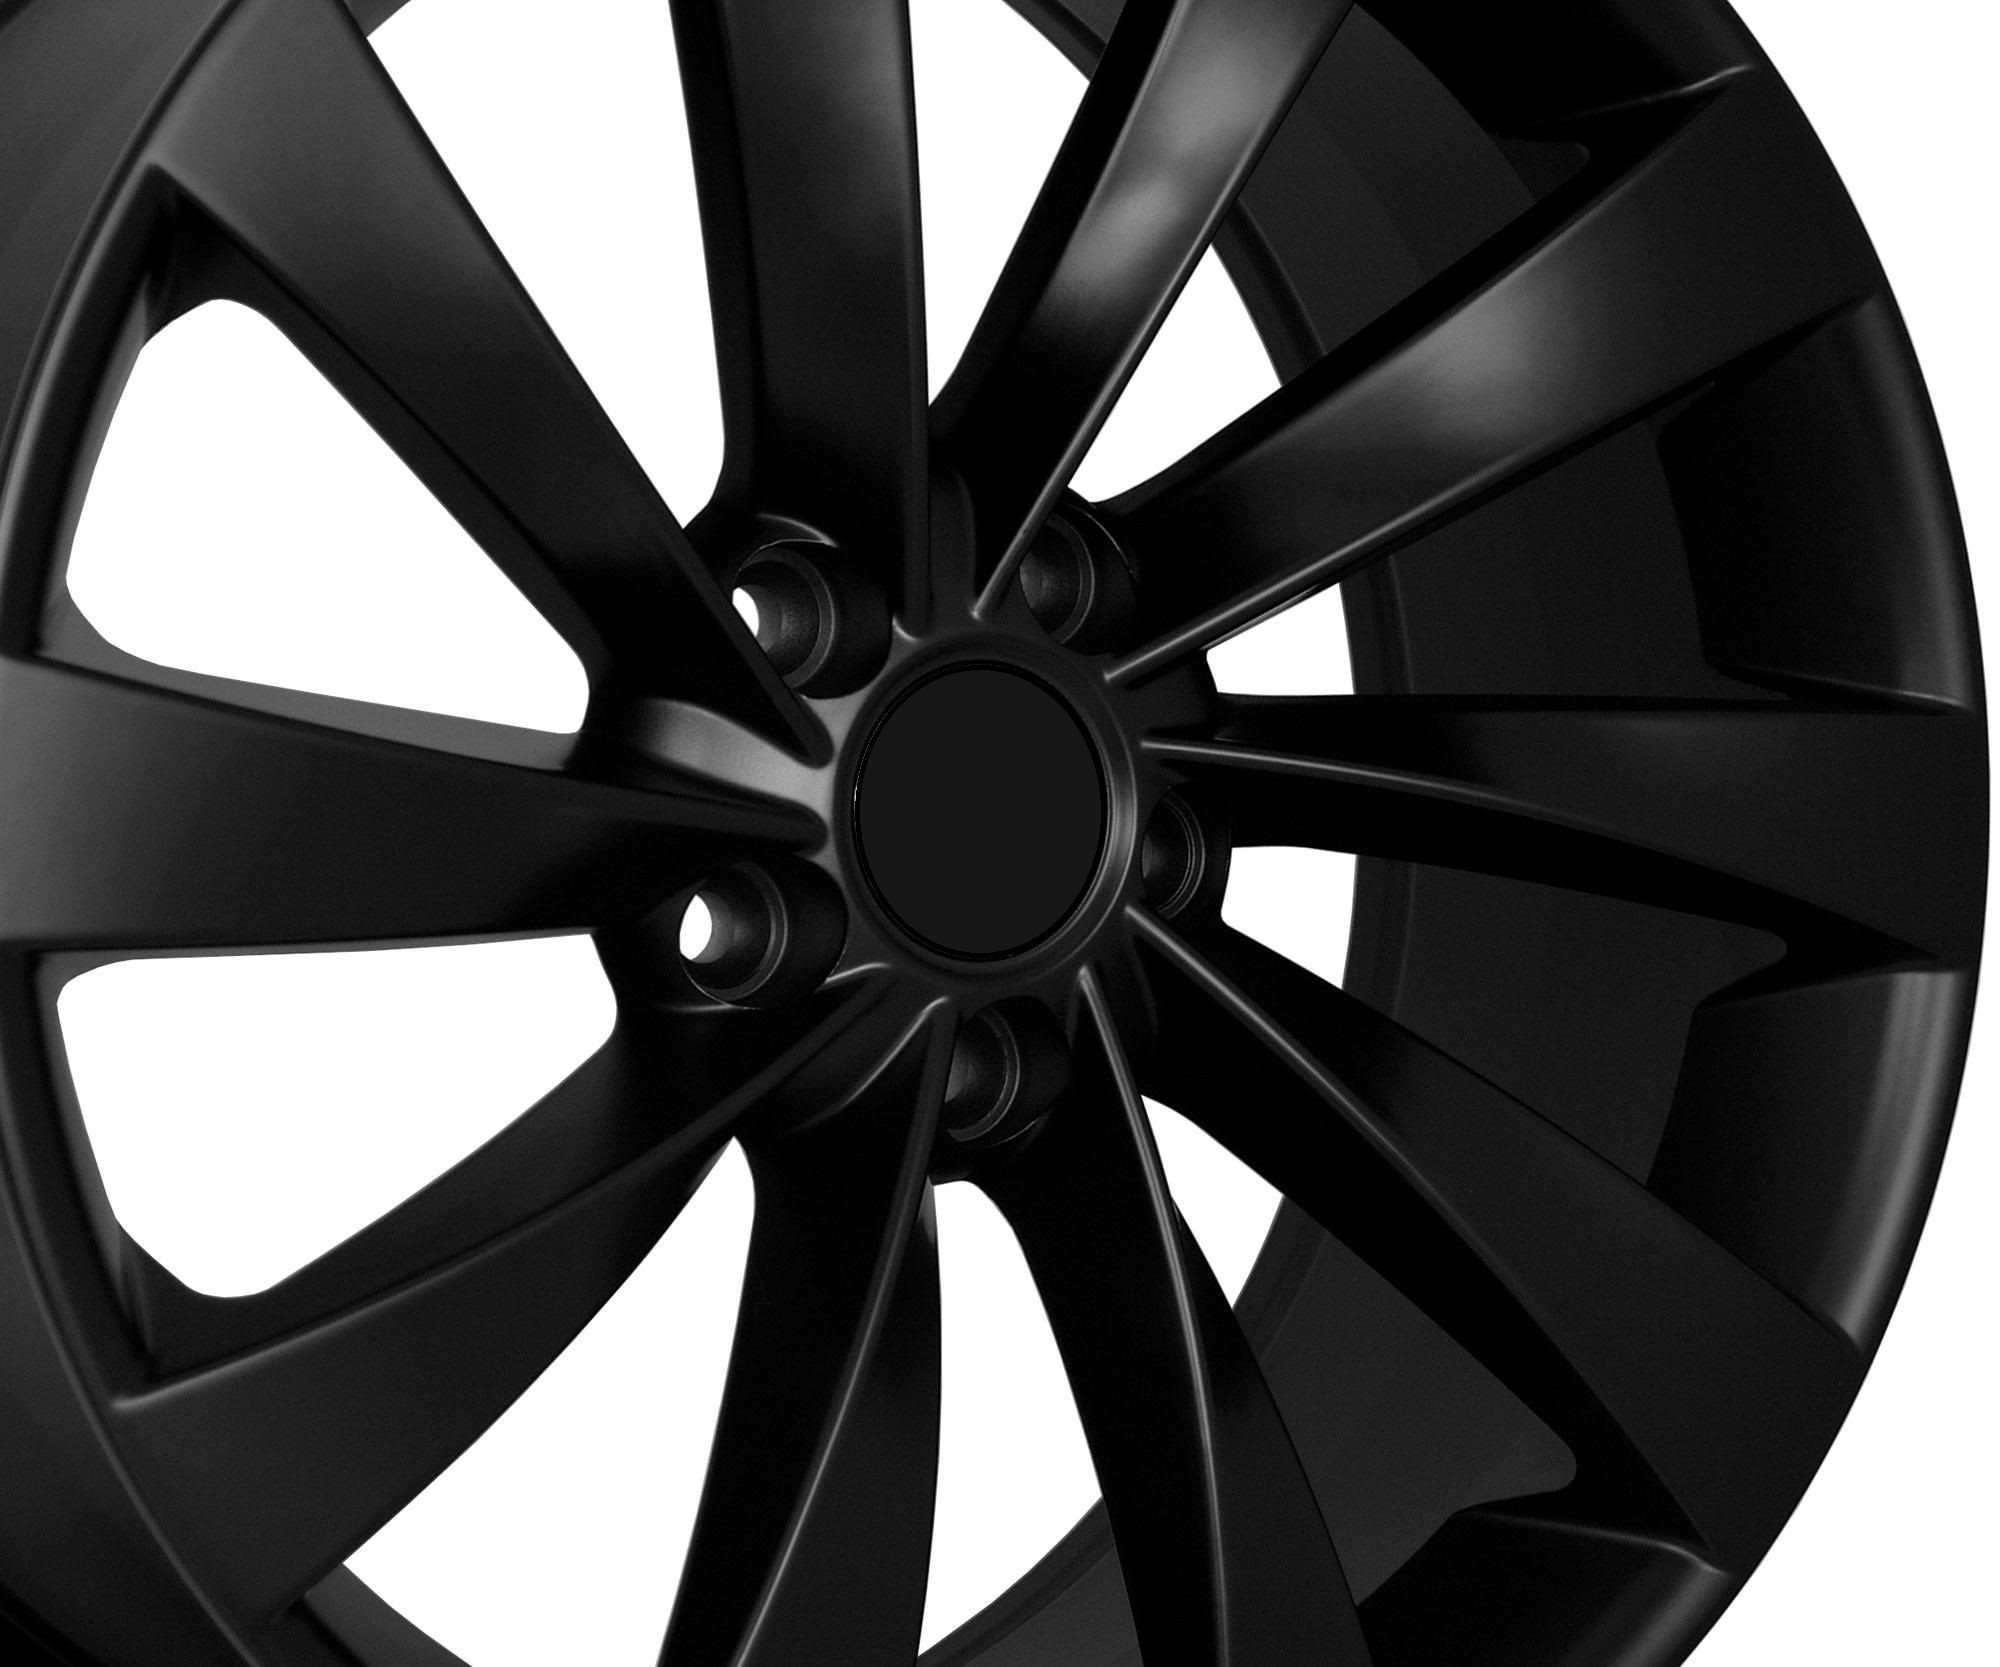 18 VW Turbine Style Matte Black Wheels Rims Fit VW Golf Rabbit GTI